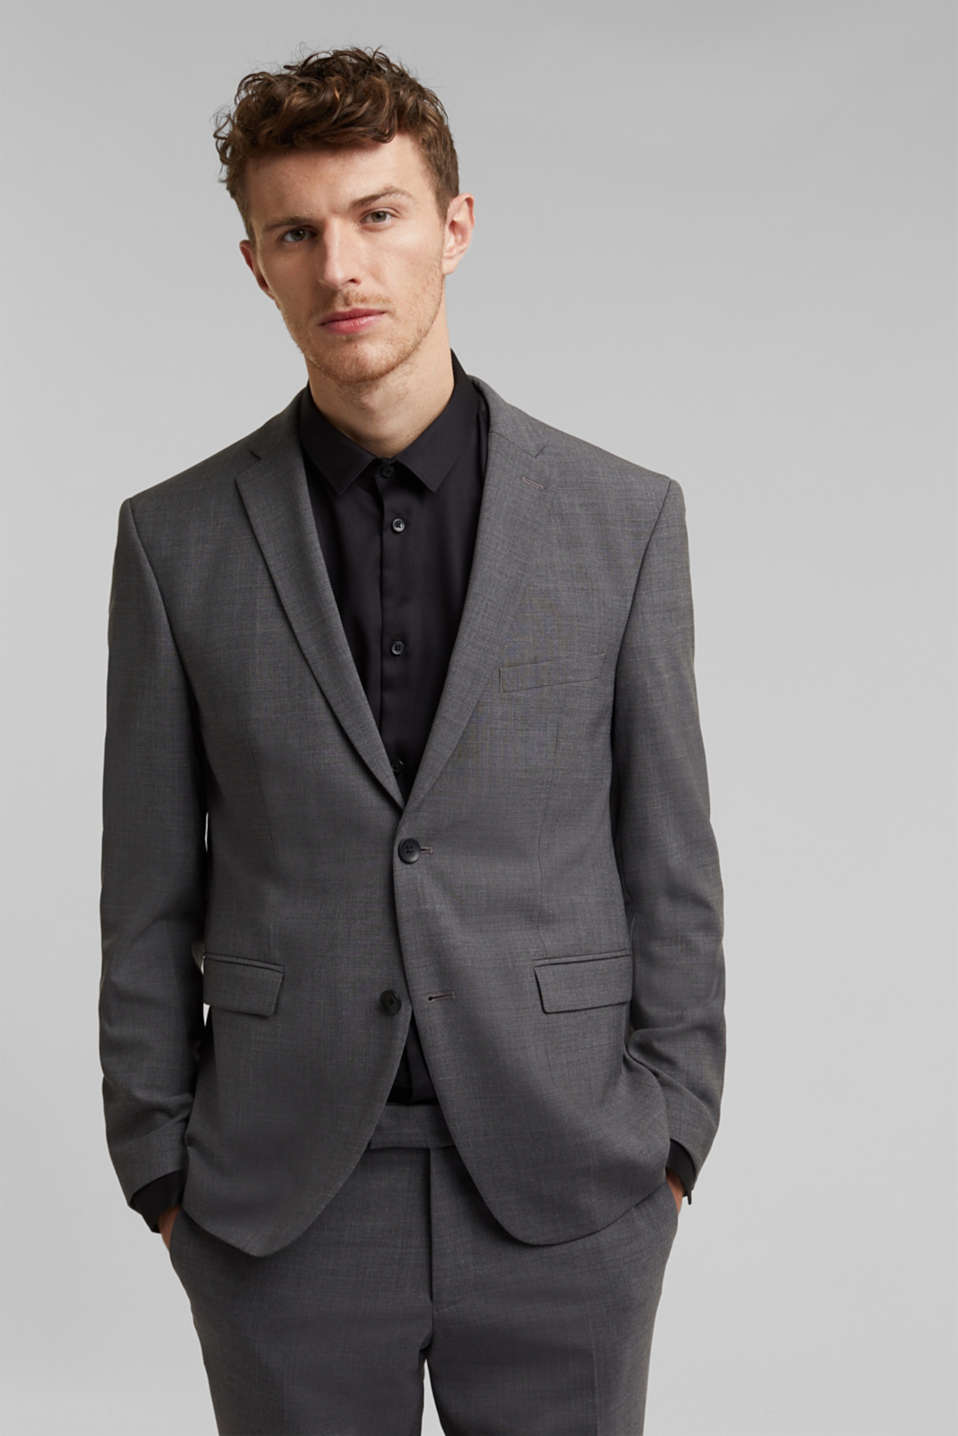 ACTIVE SUIT tailored jacket, wool blend, DARK GREY 5, detail image number 0